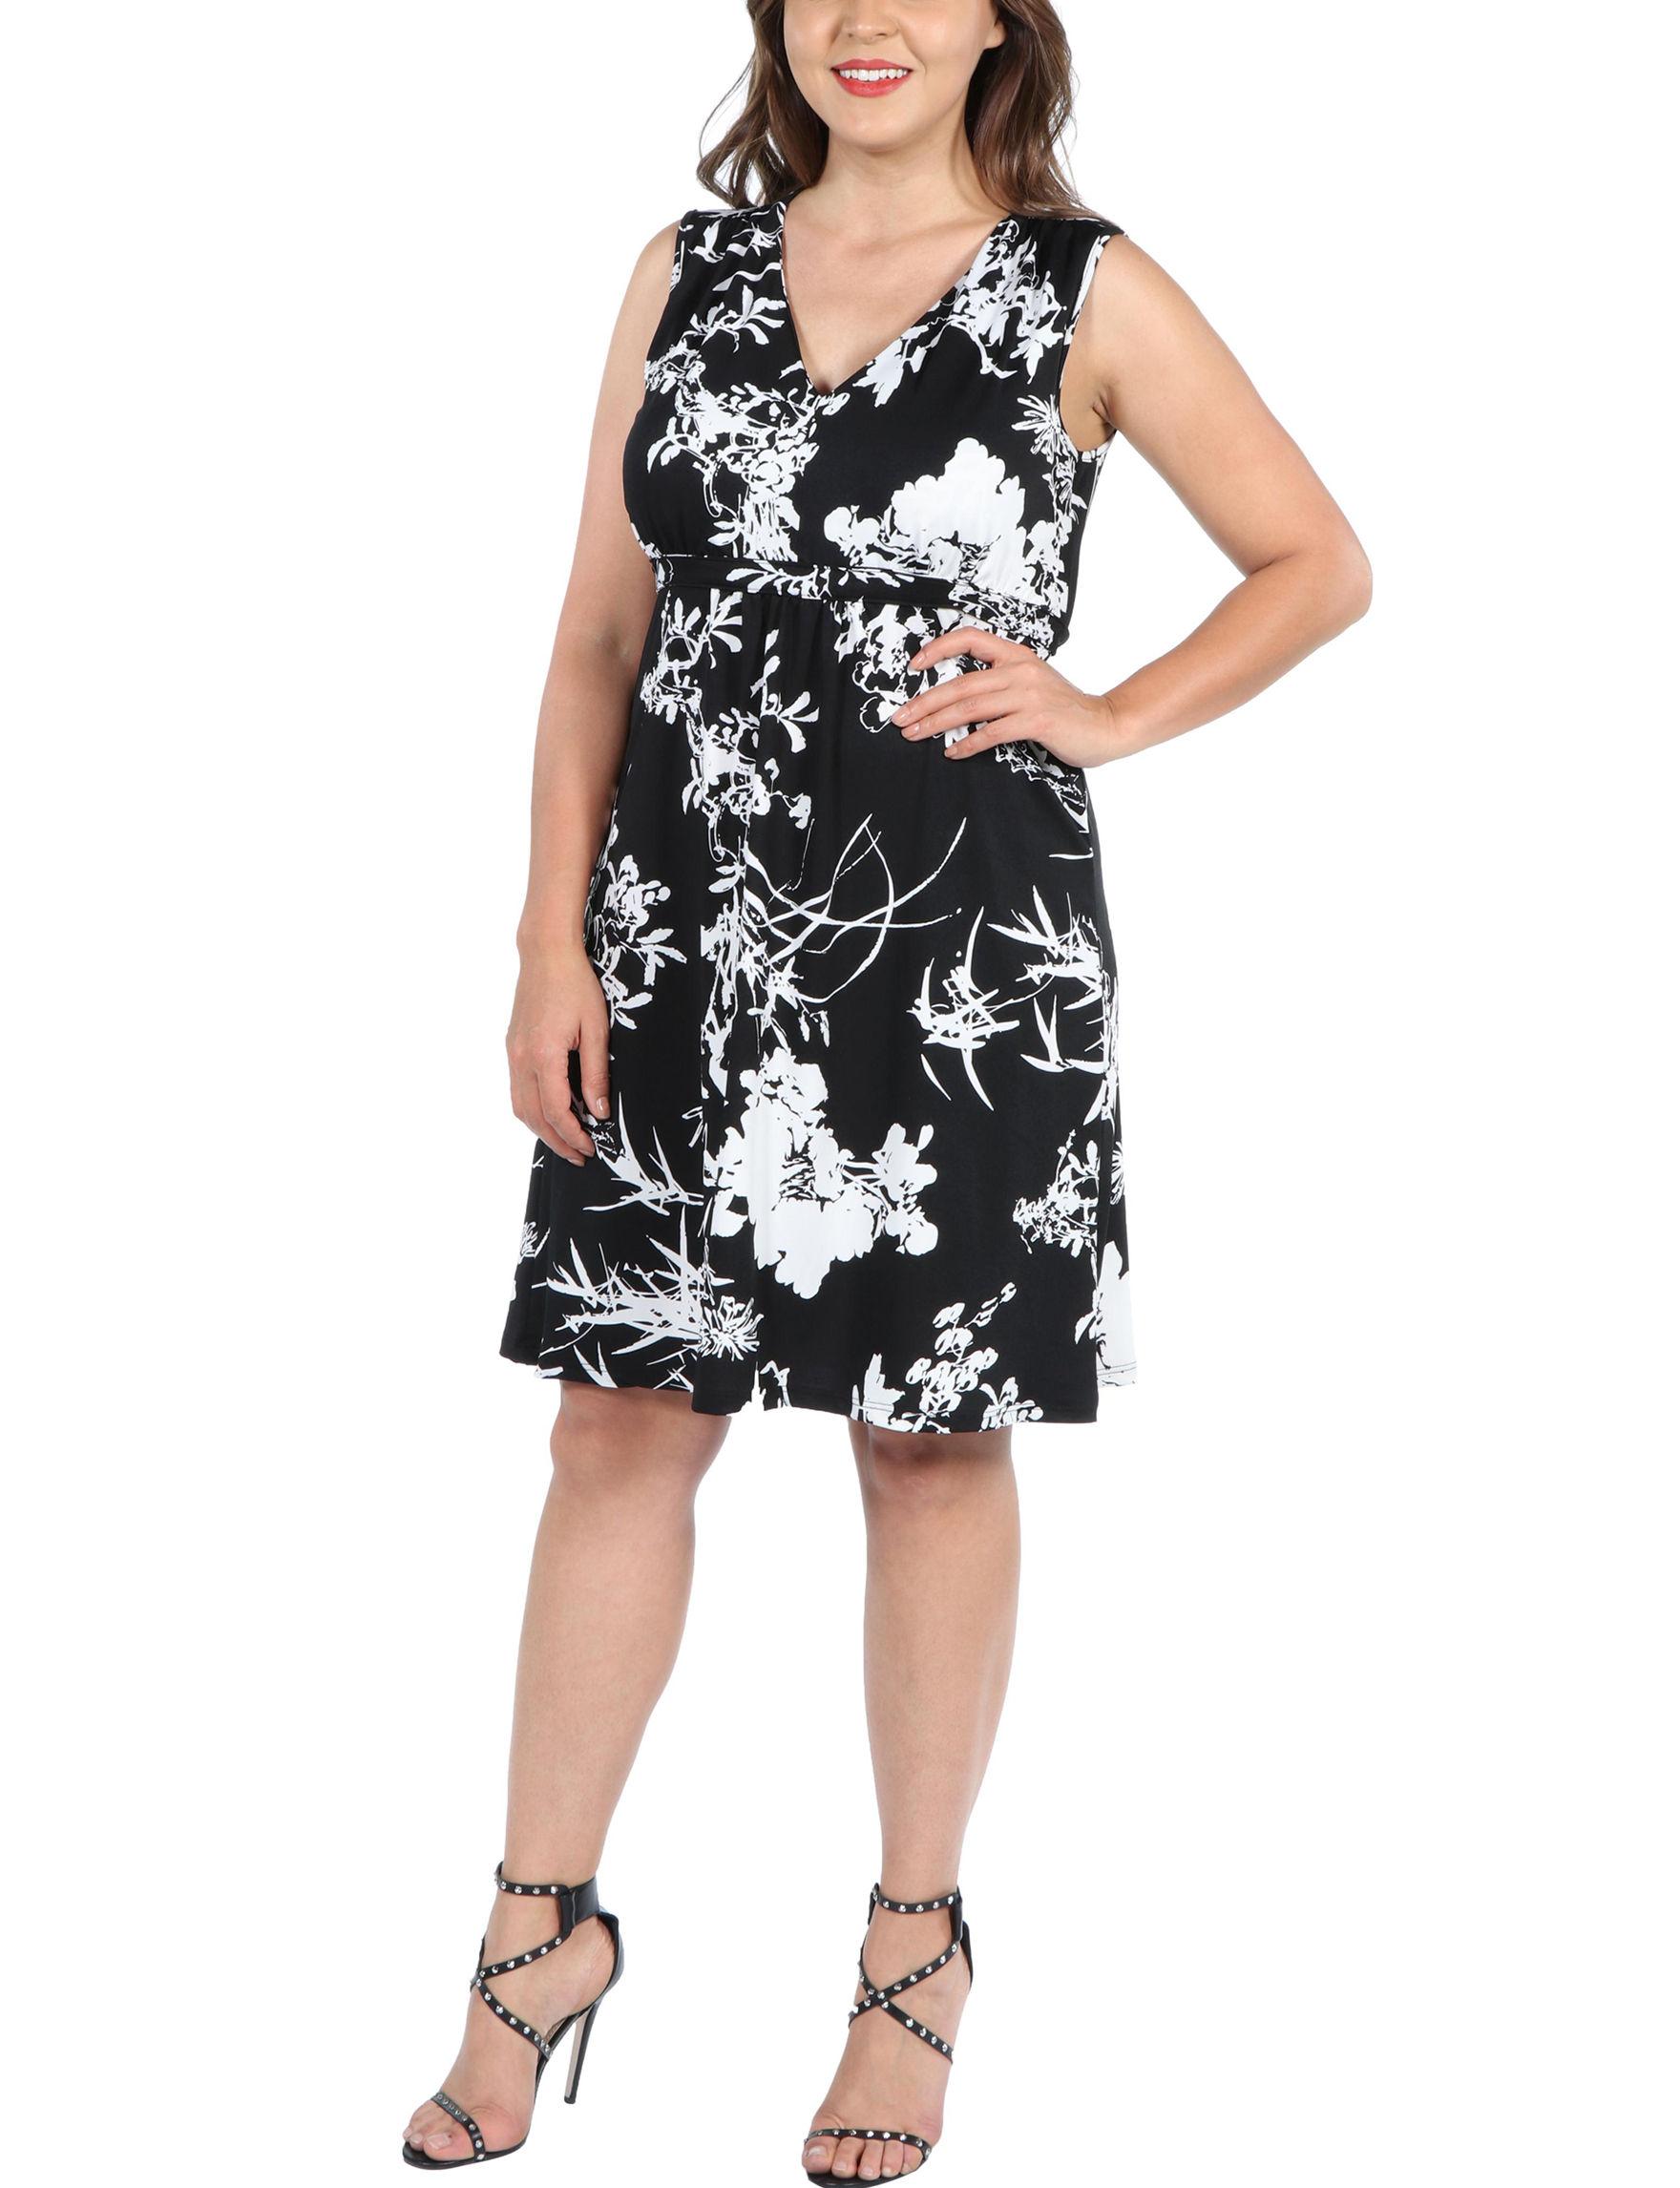 24Seven Comfort Apparel Black Multi Everyday & Casual A-line Dresses